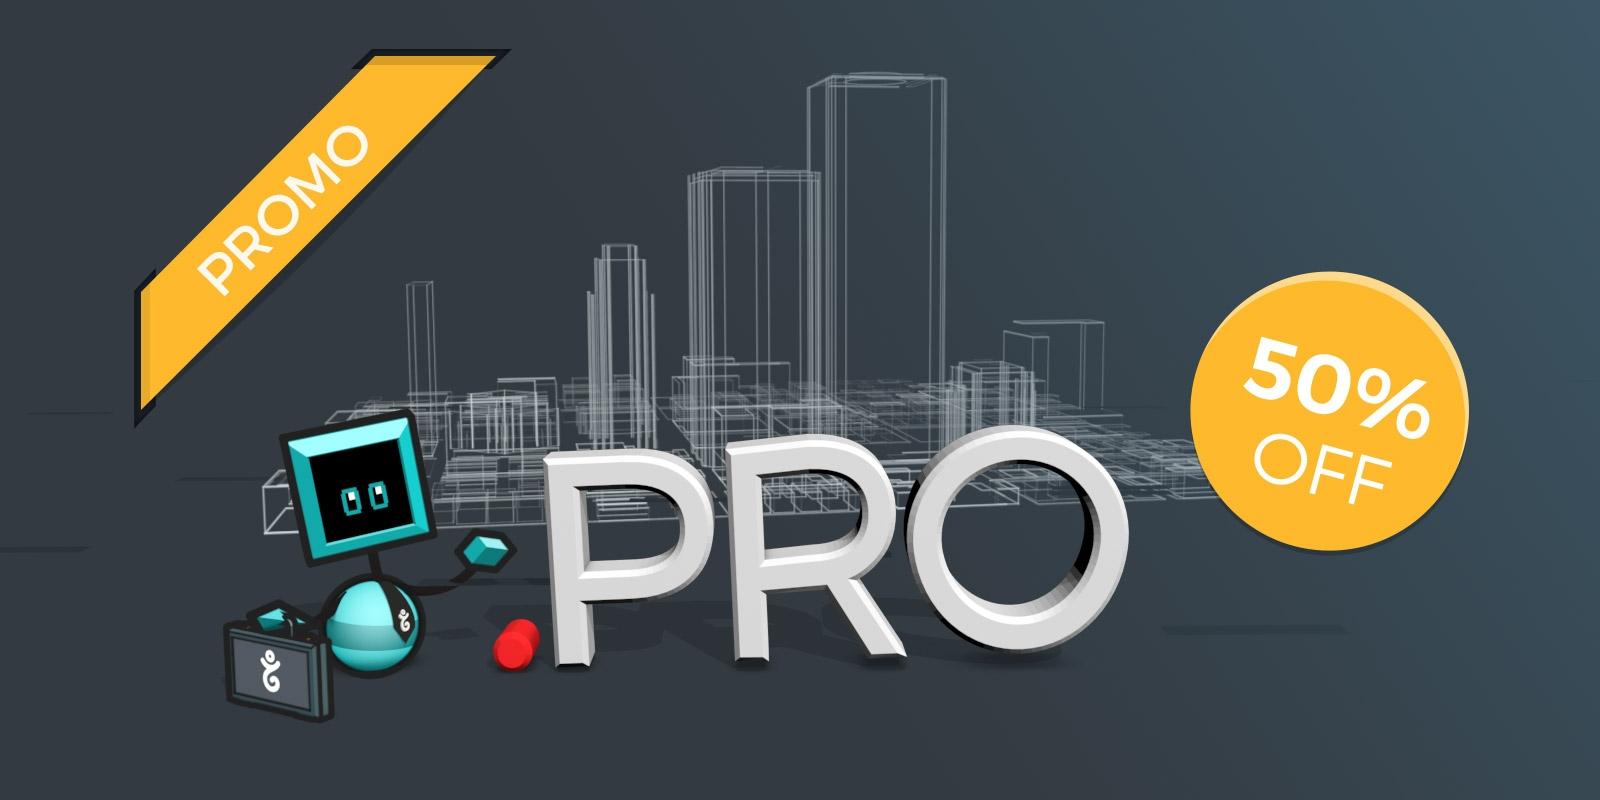 Go .pro this spring at half-price